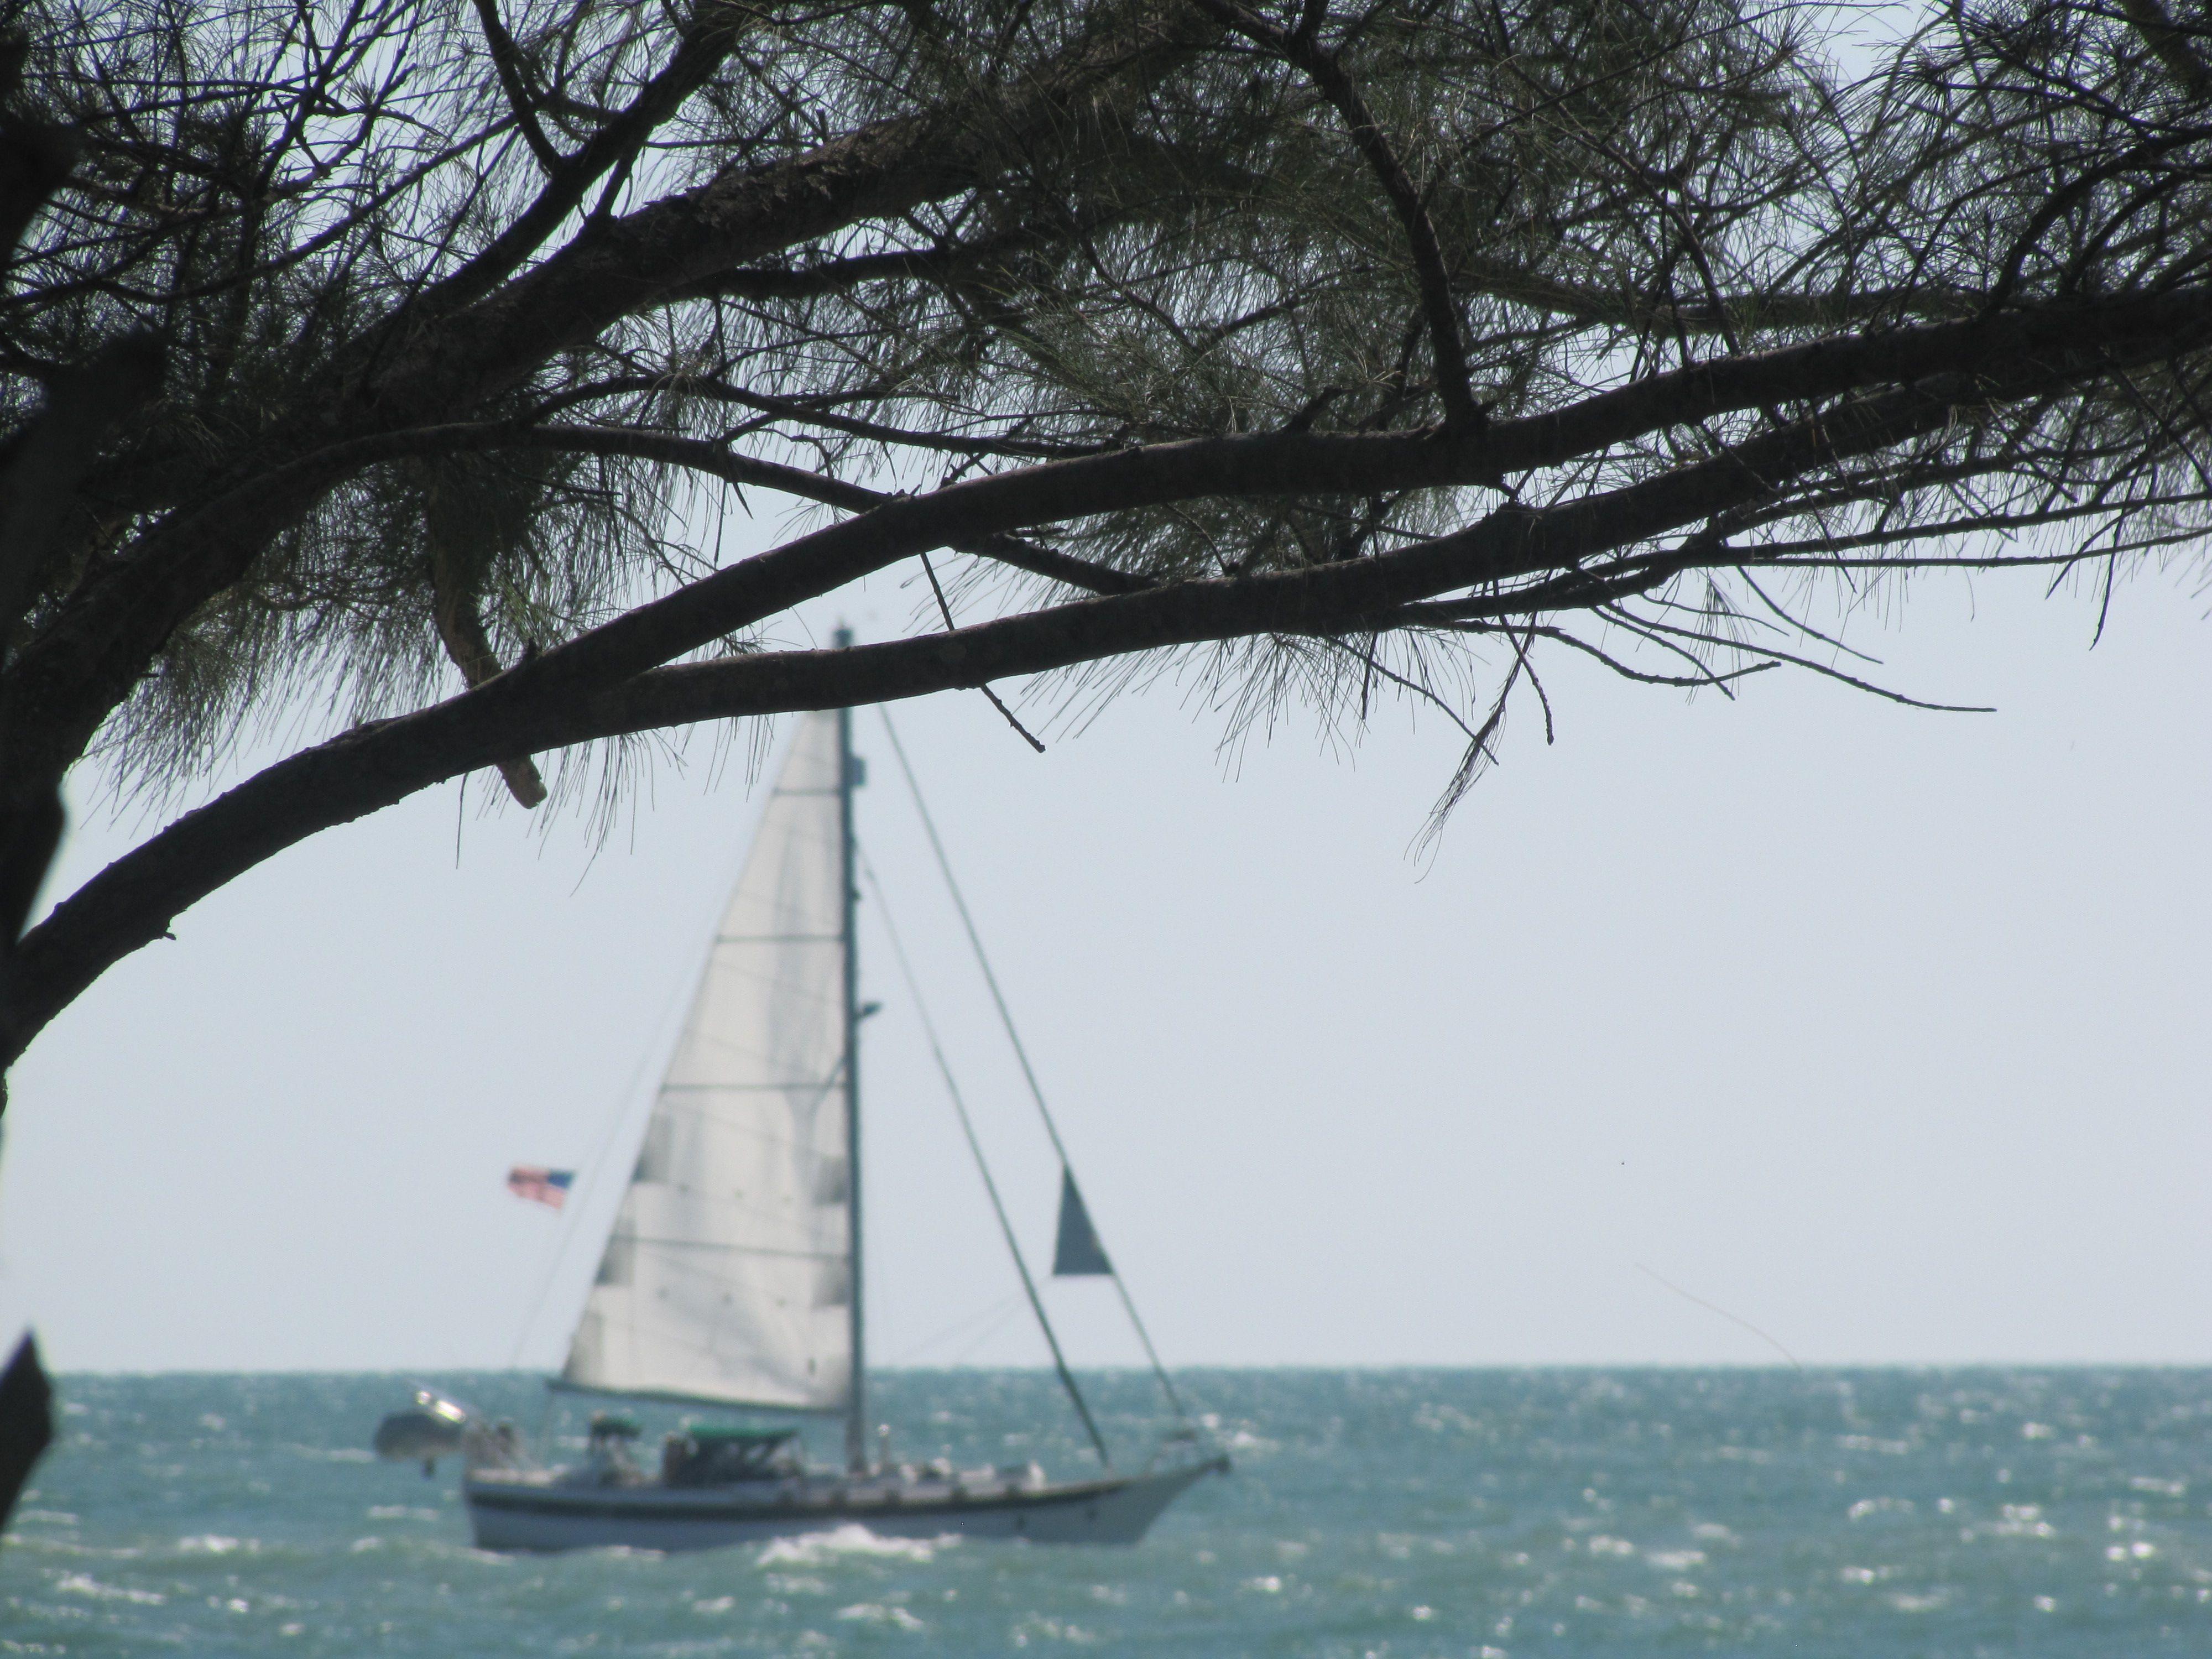 At the jetty venice fl photo by cinda photo sailing